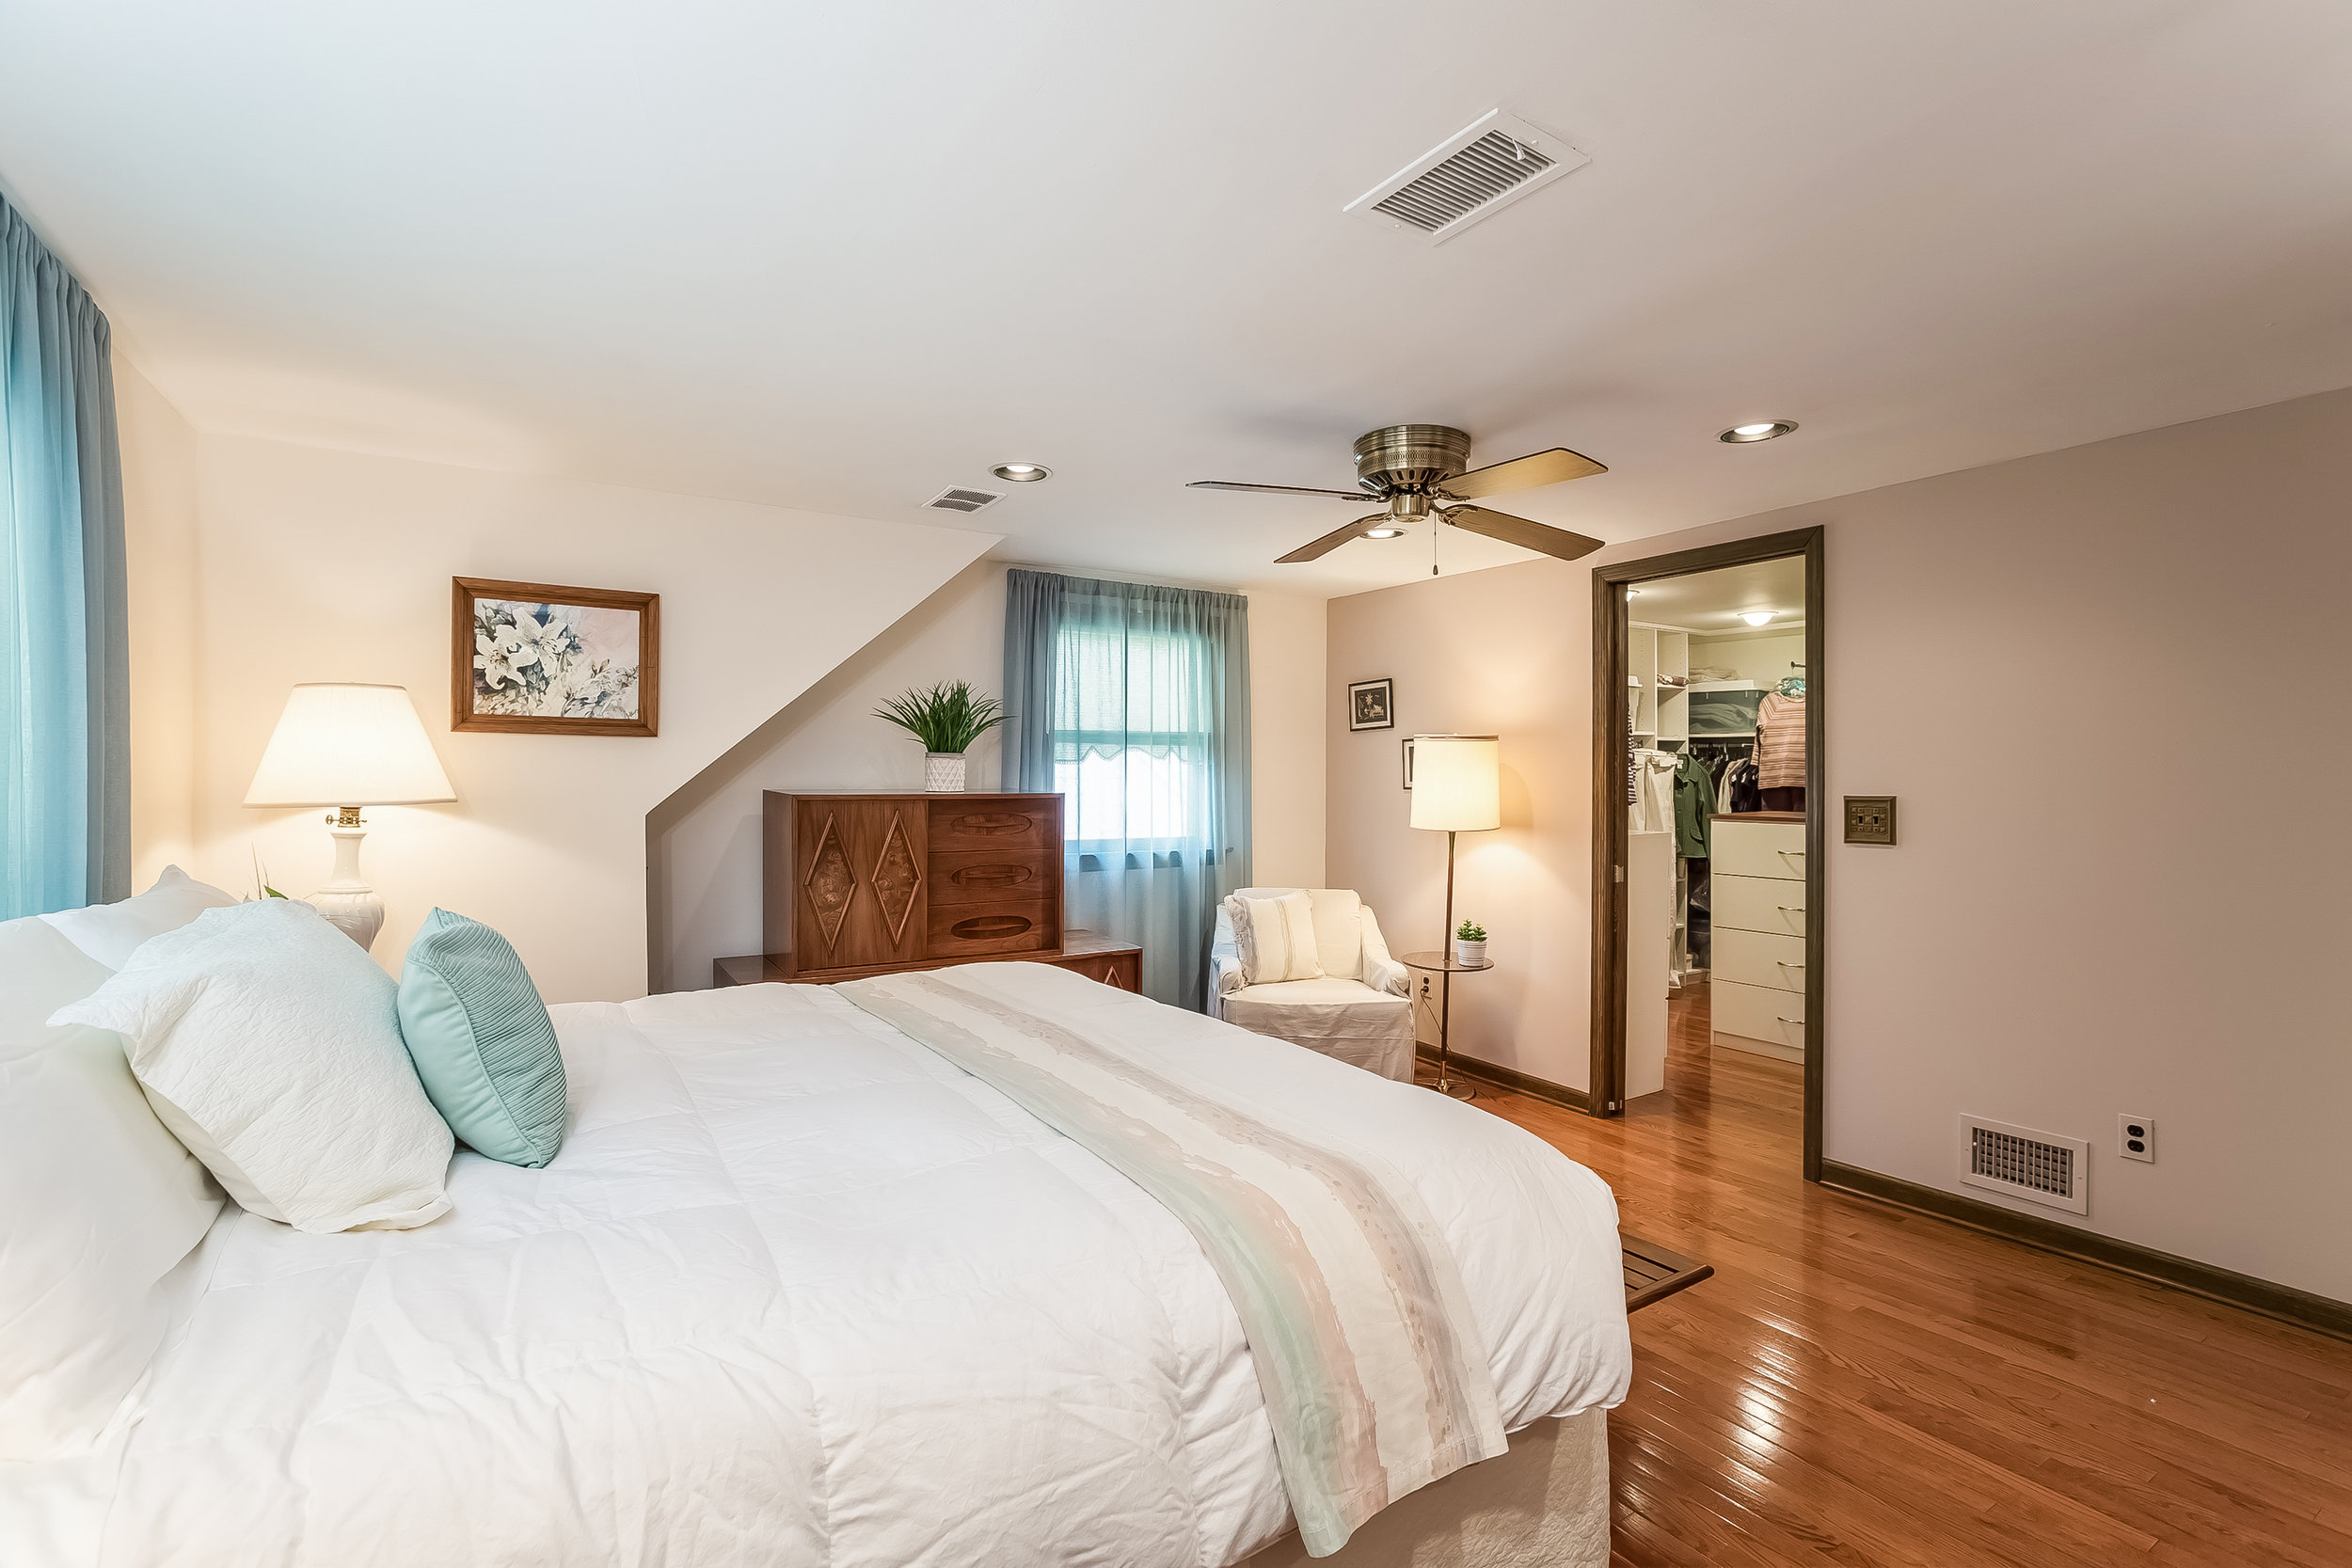 040-Master_Bedroom-4933075-large.jpg